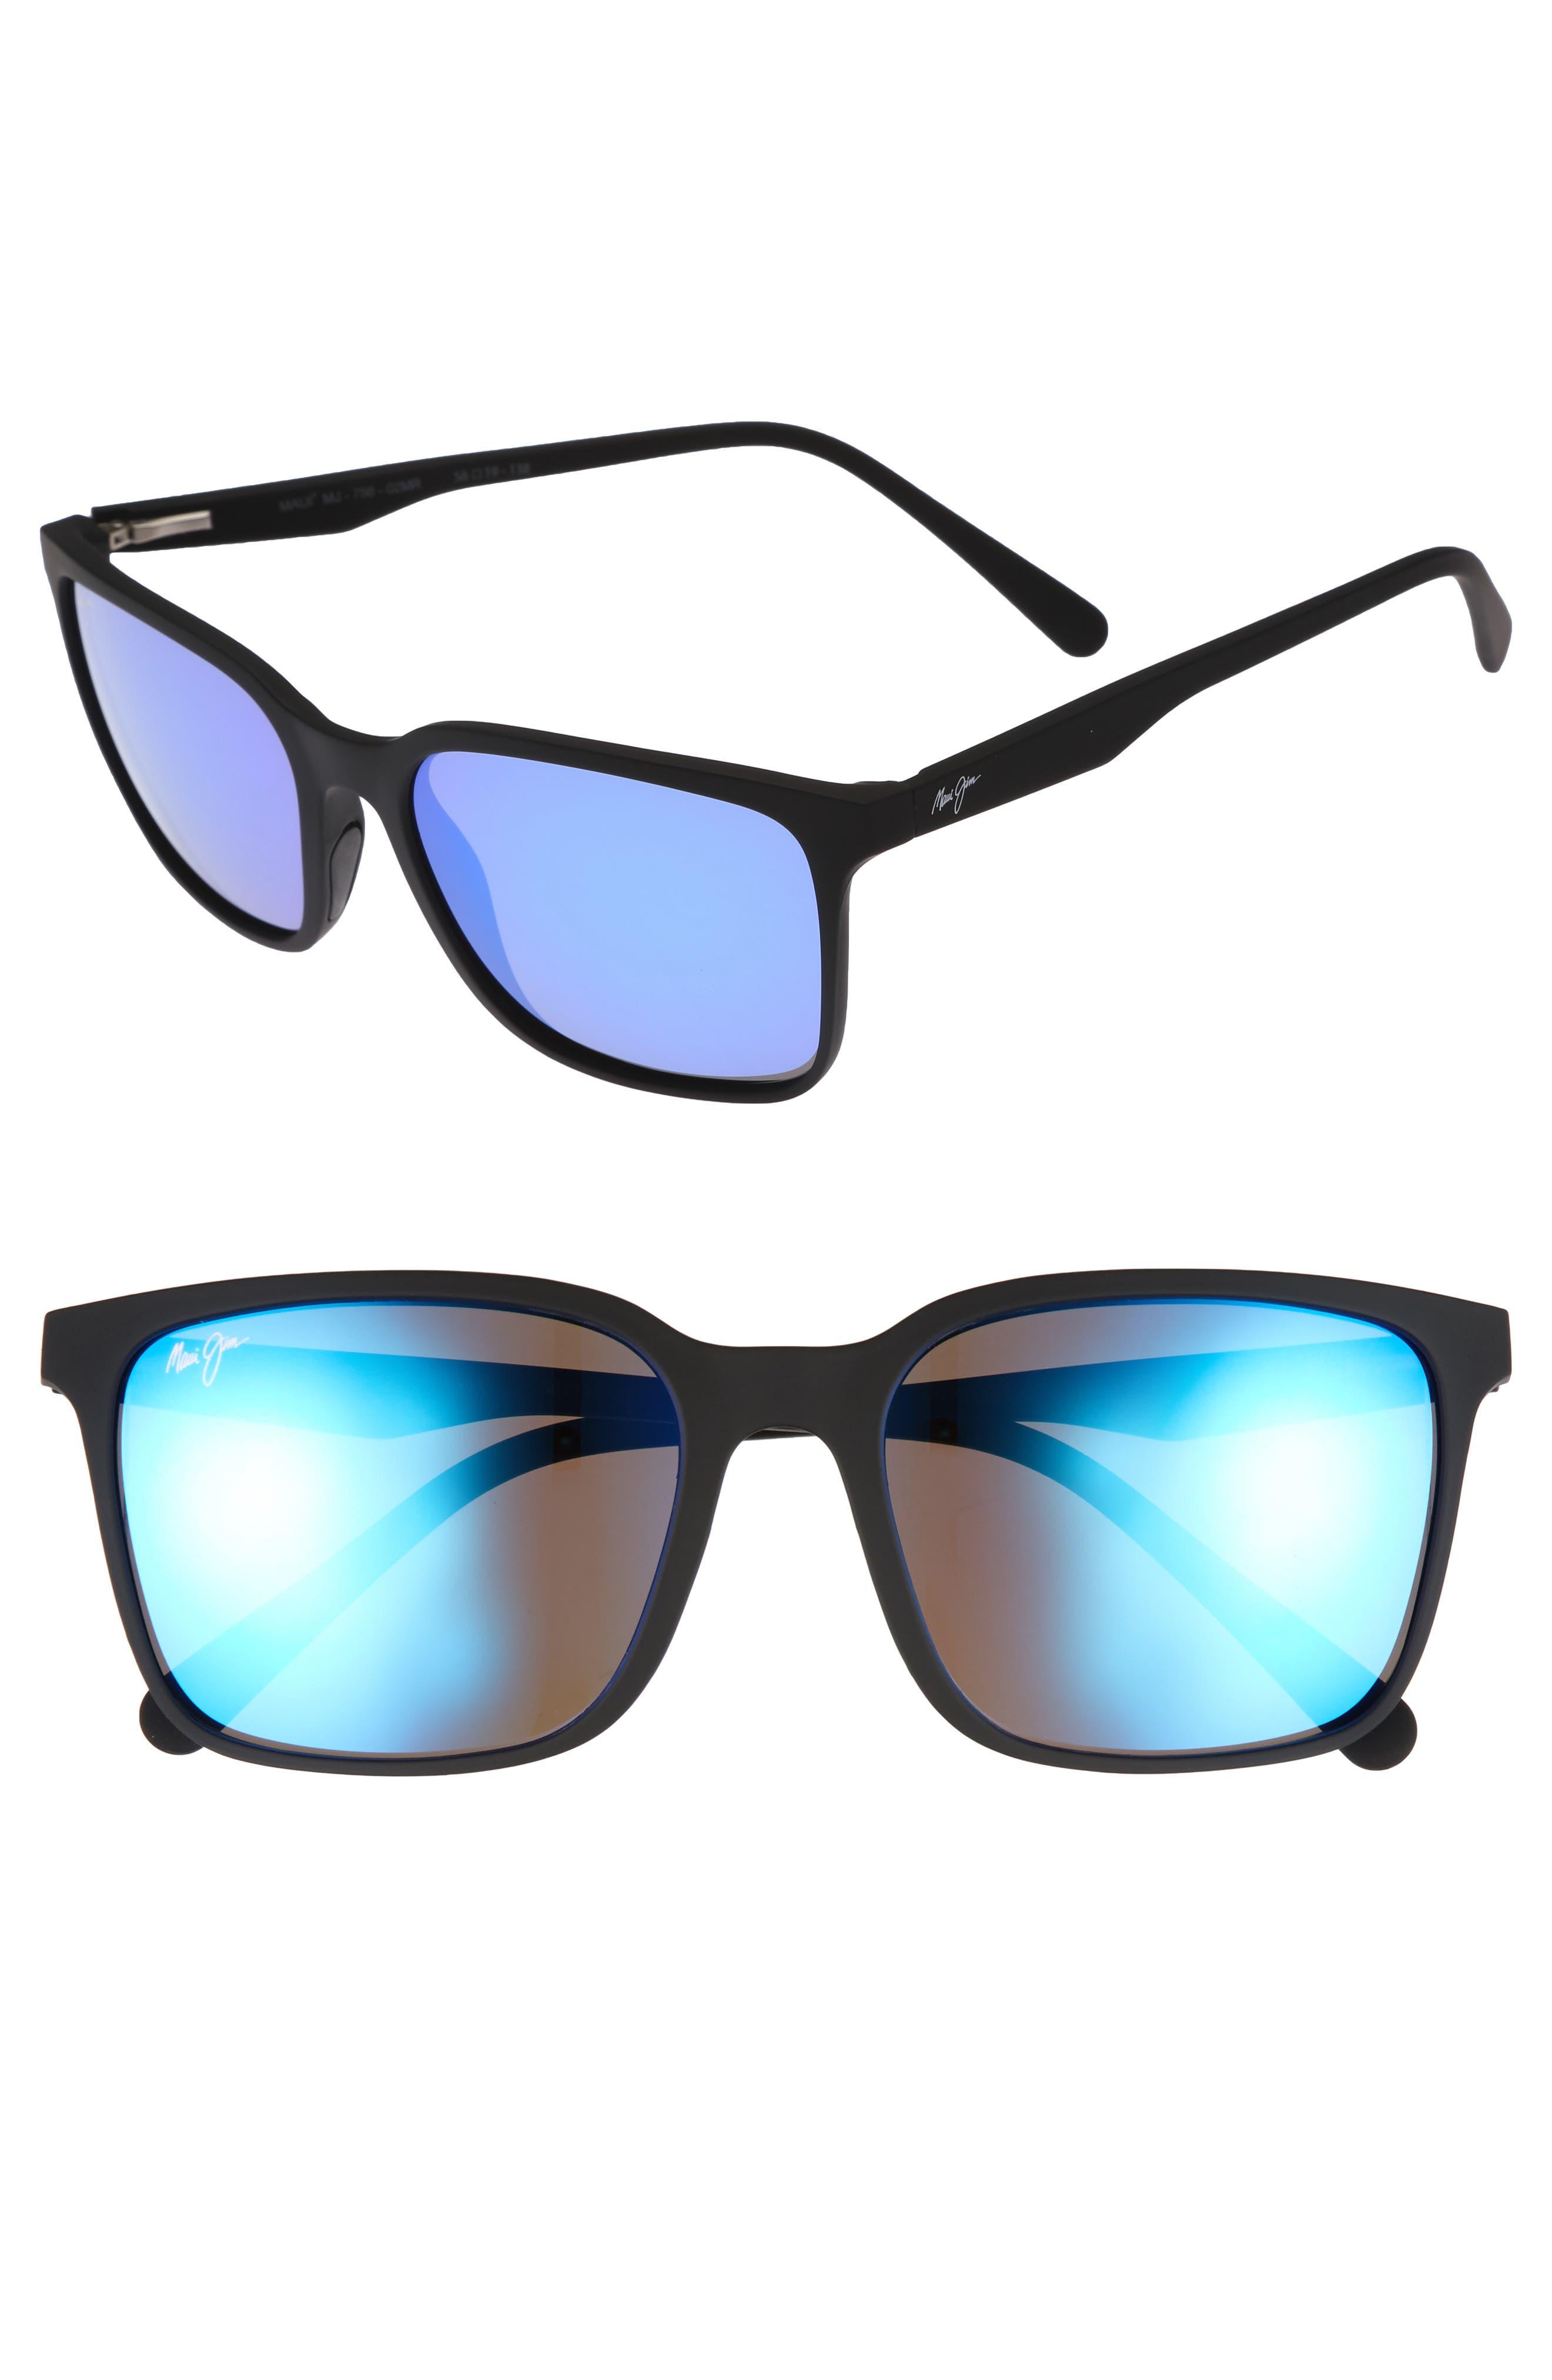 Wild Coast 56mm Polarized Sunglasses,                             Main thumbnail 1, color,                             Matte Black/ Blue Hawaii